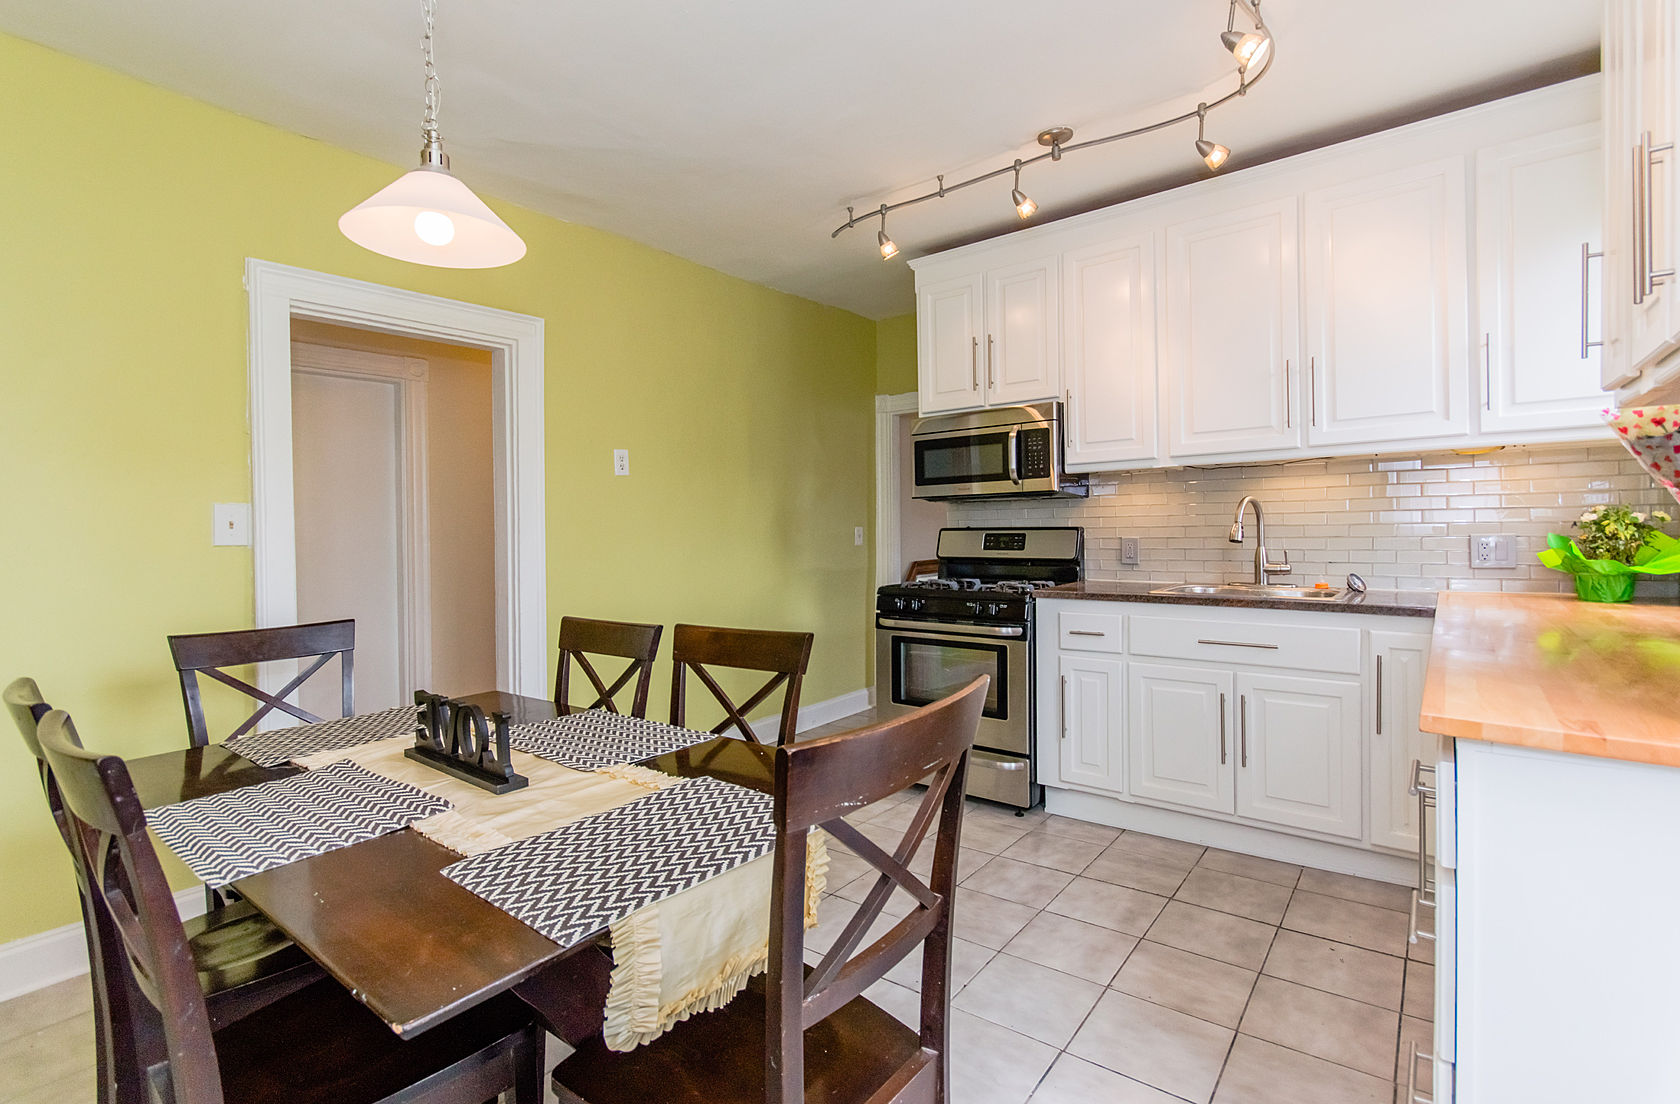 Multi-Family Home for Sale at 87 Glenway Street Boston, Massachusetts 02121 United States